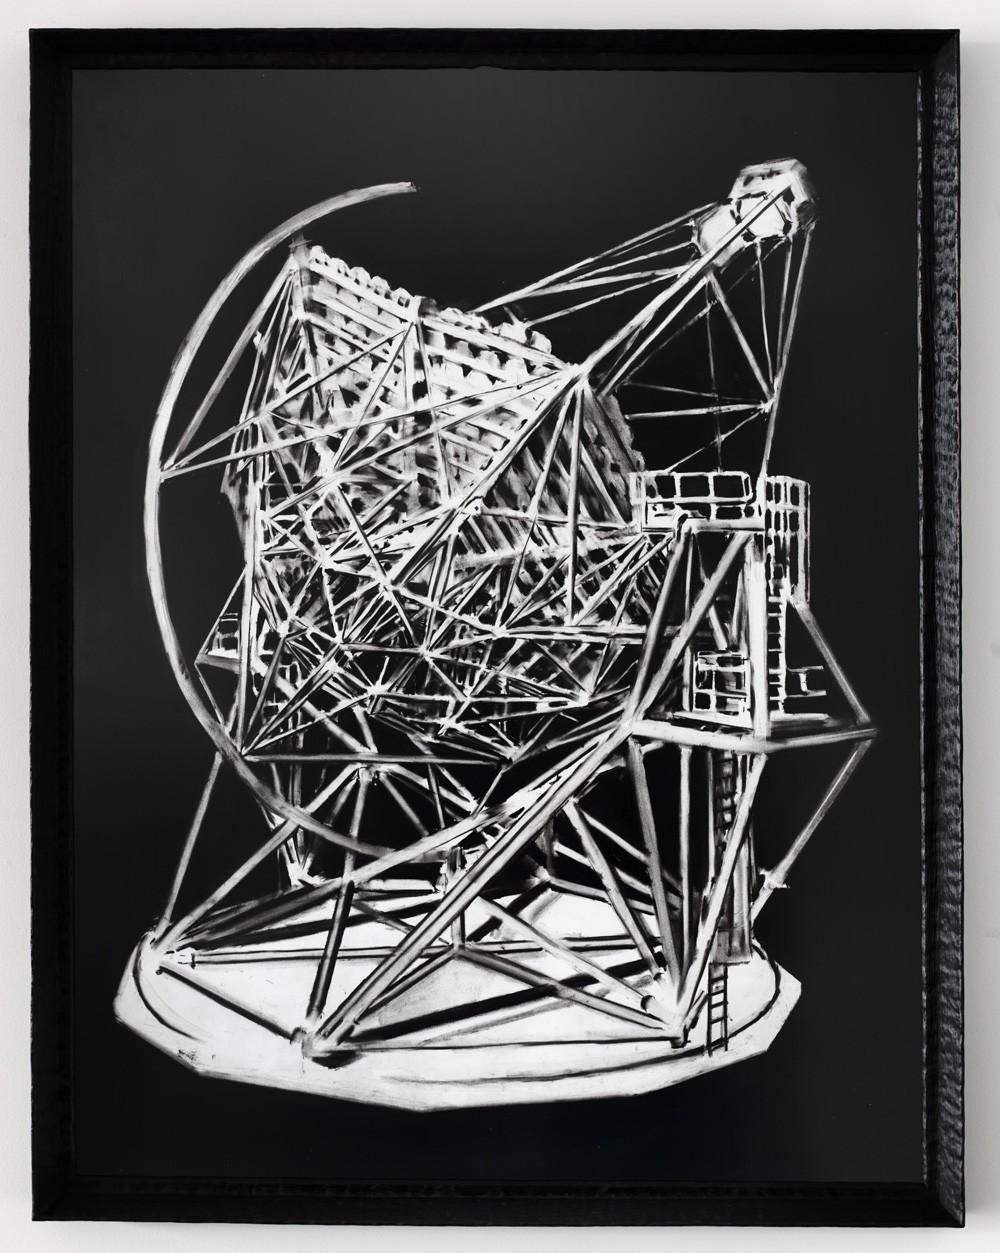 Douglas Stichbury  Desk ornament , 2015 Framed charcoal on paper 1100 x 835 mm  _______